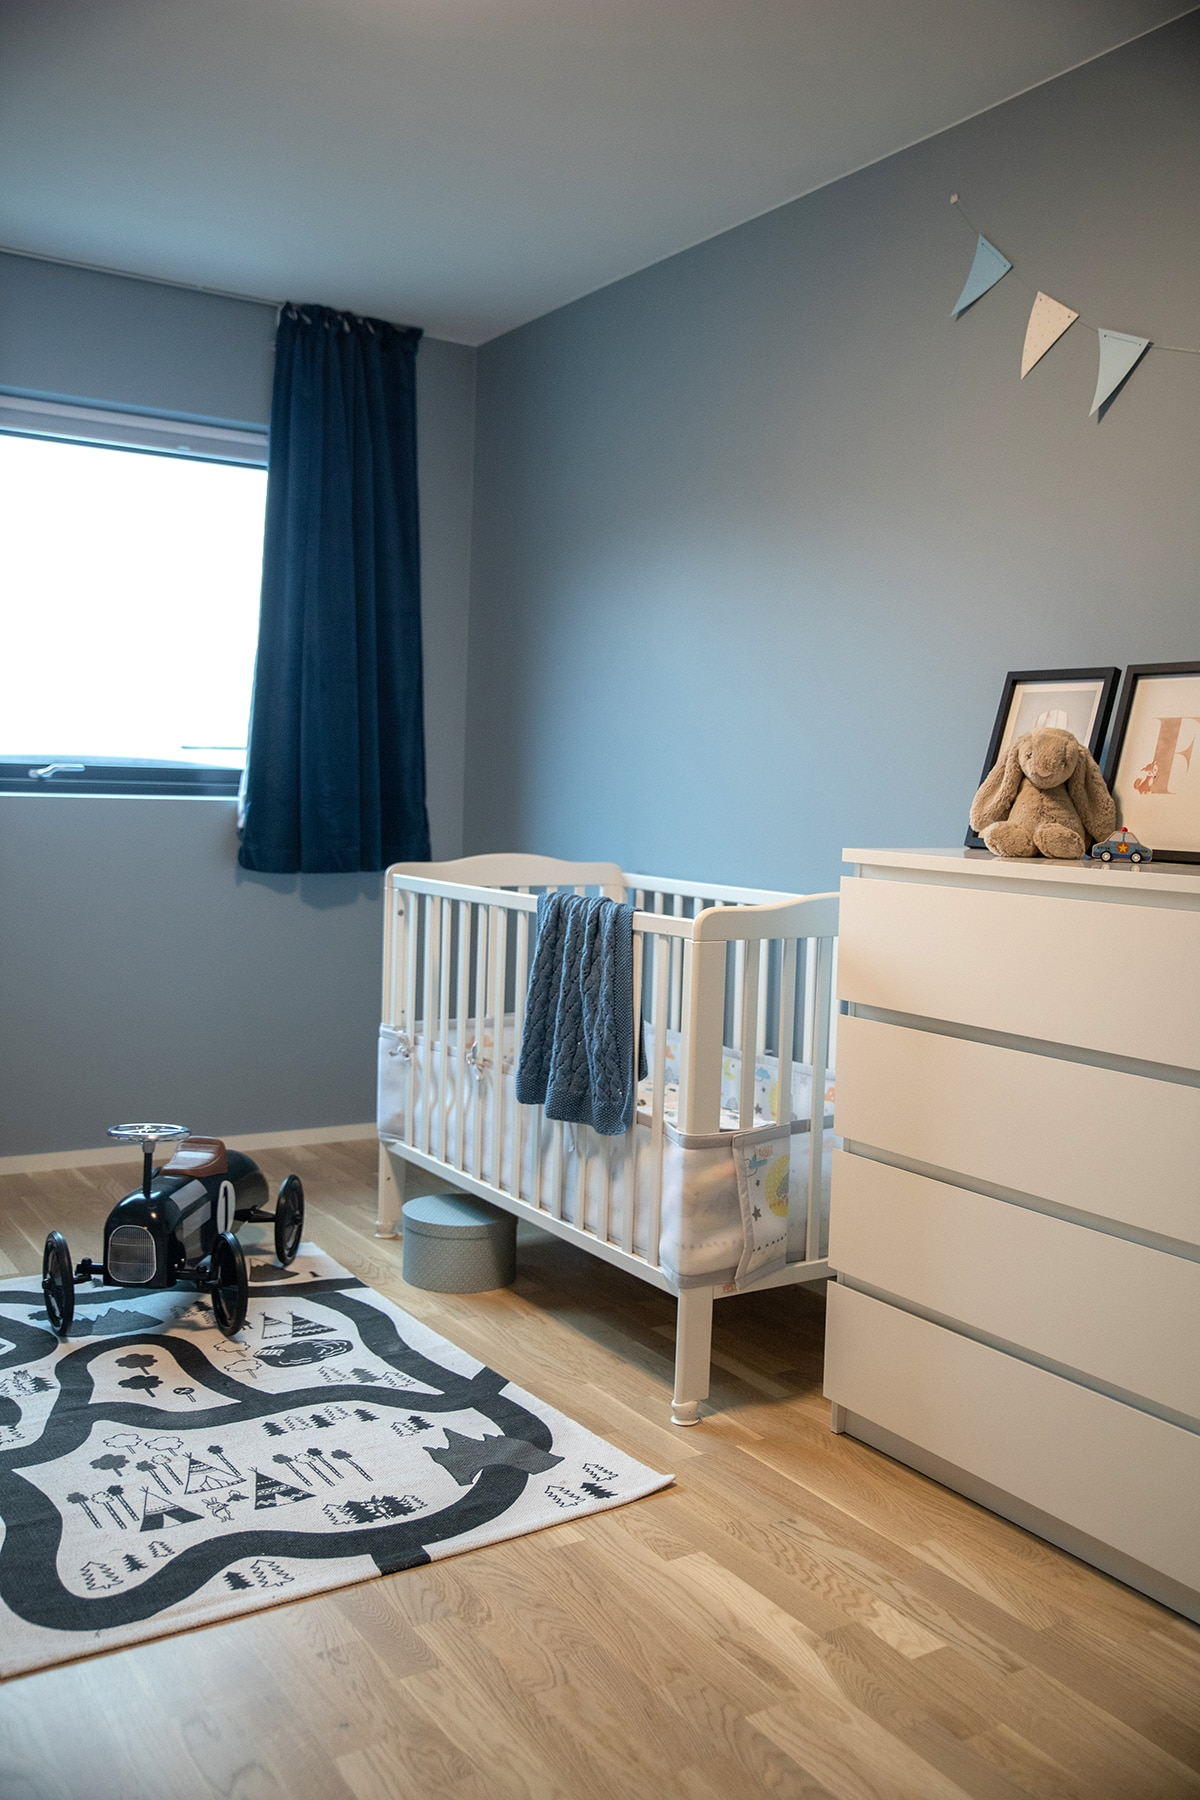 Barnerom med moderne fargekombinasjoner - Villa jentoft i Haugesund